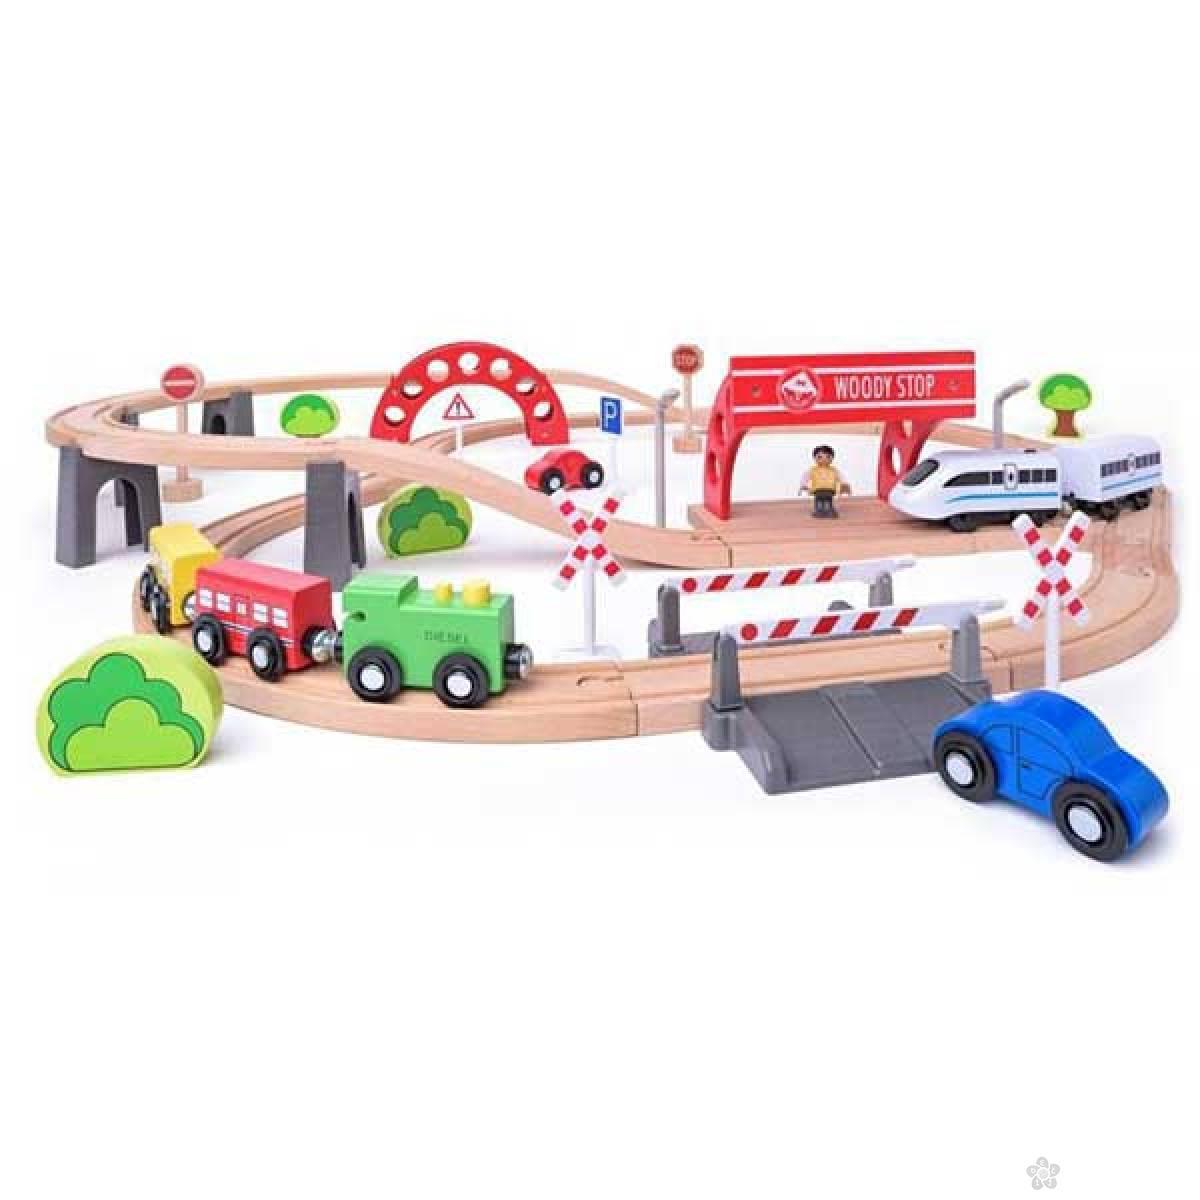 Pruga sa električnom lokomotivom Woody 93064